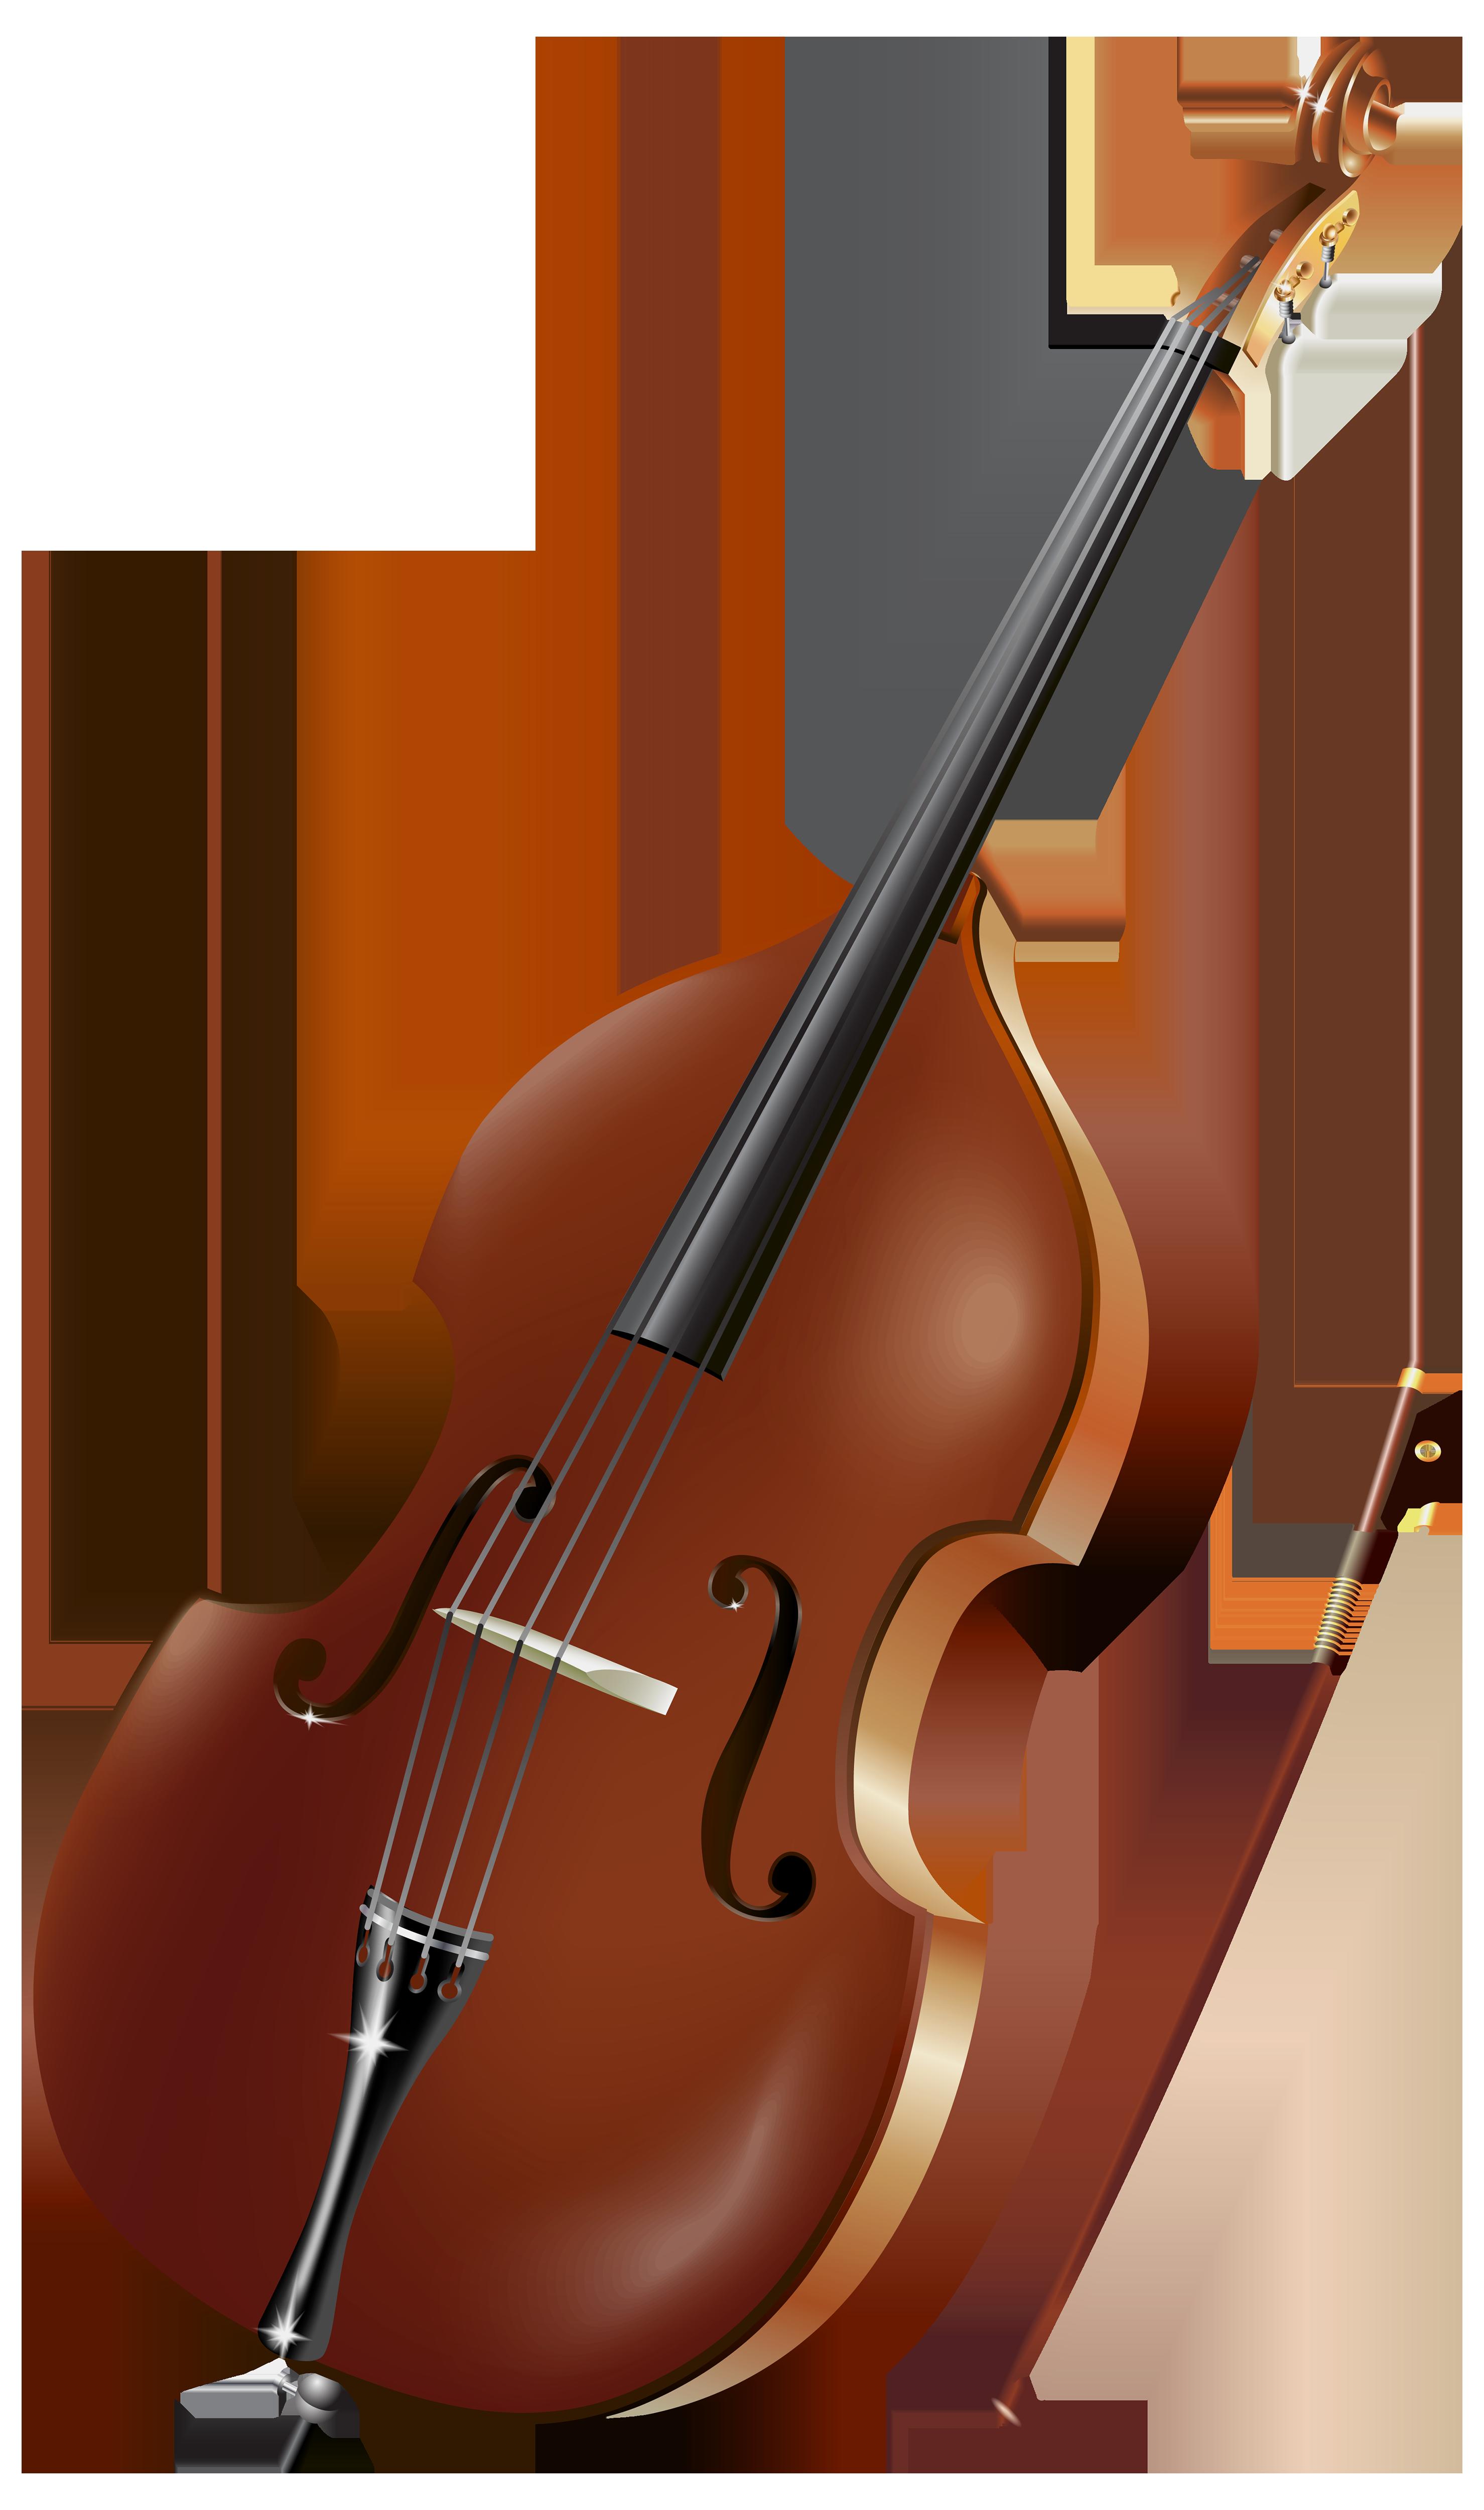 Double bass Violin Musical Instruments Cello Clip art.